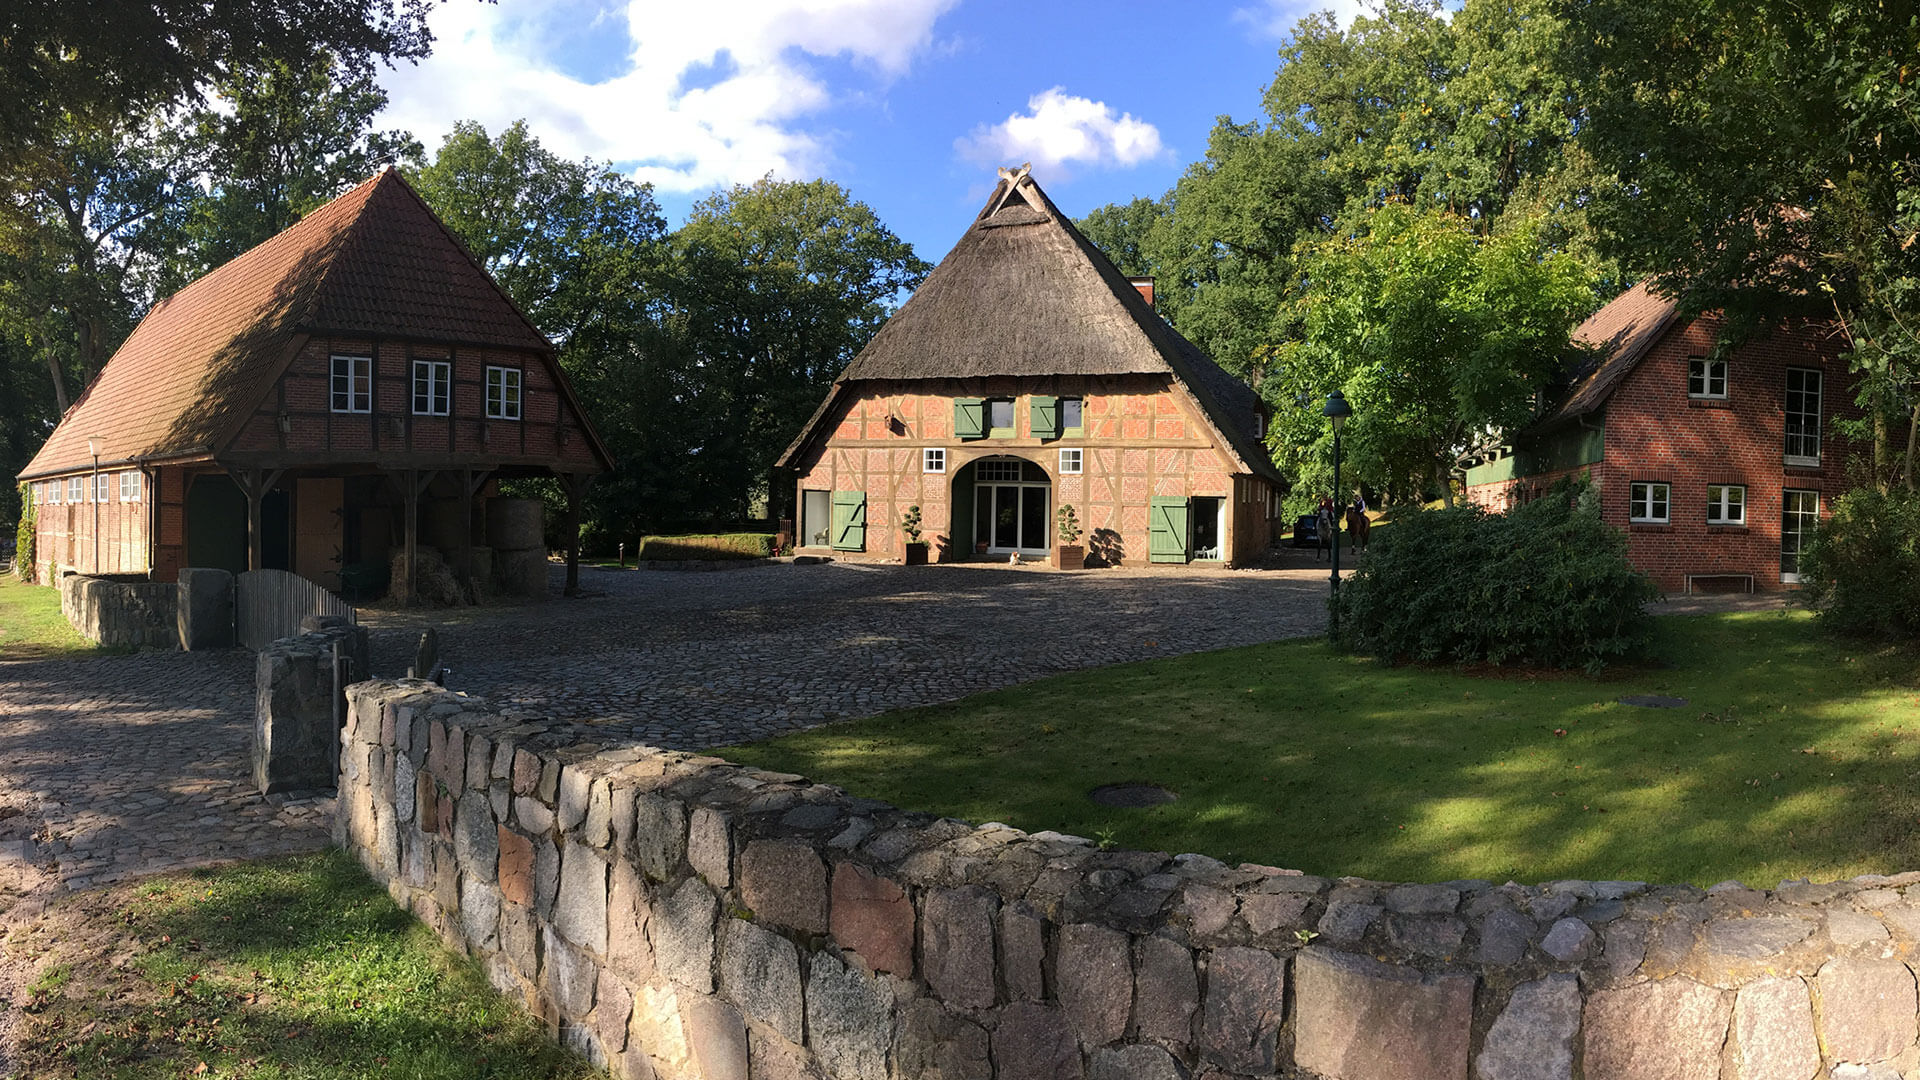 Courtyard of Heinshof farm